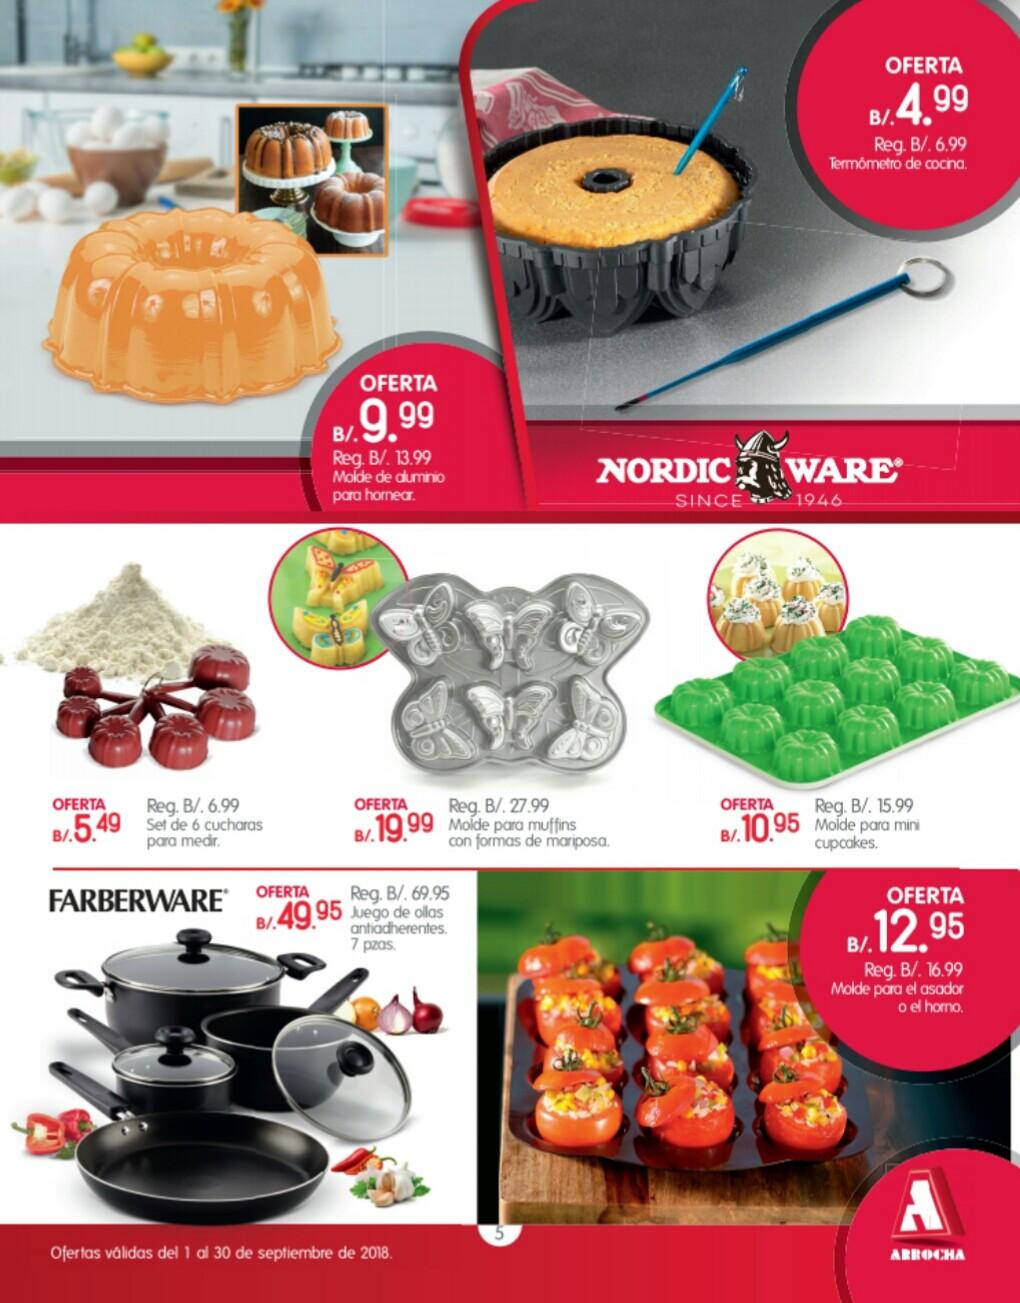 Catalogo de ofertas Arrocha -septiembre 2018 p5